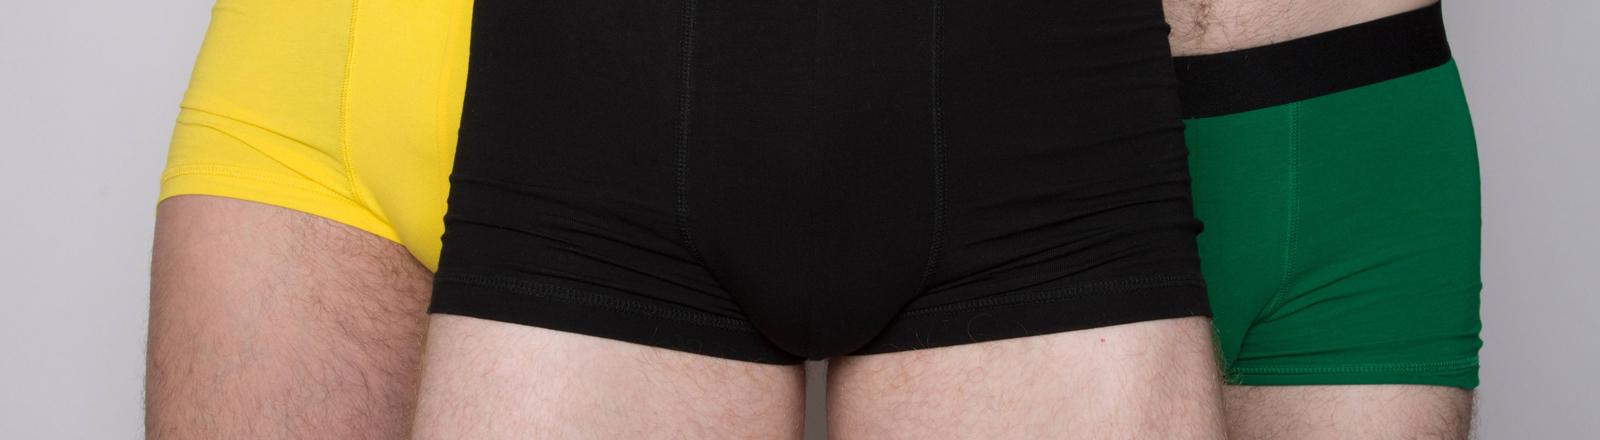 Drei Männer in bunten Unterhosen